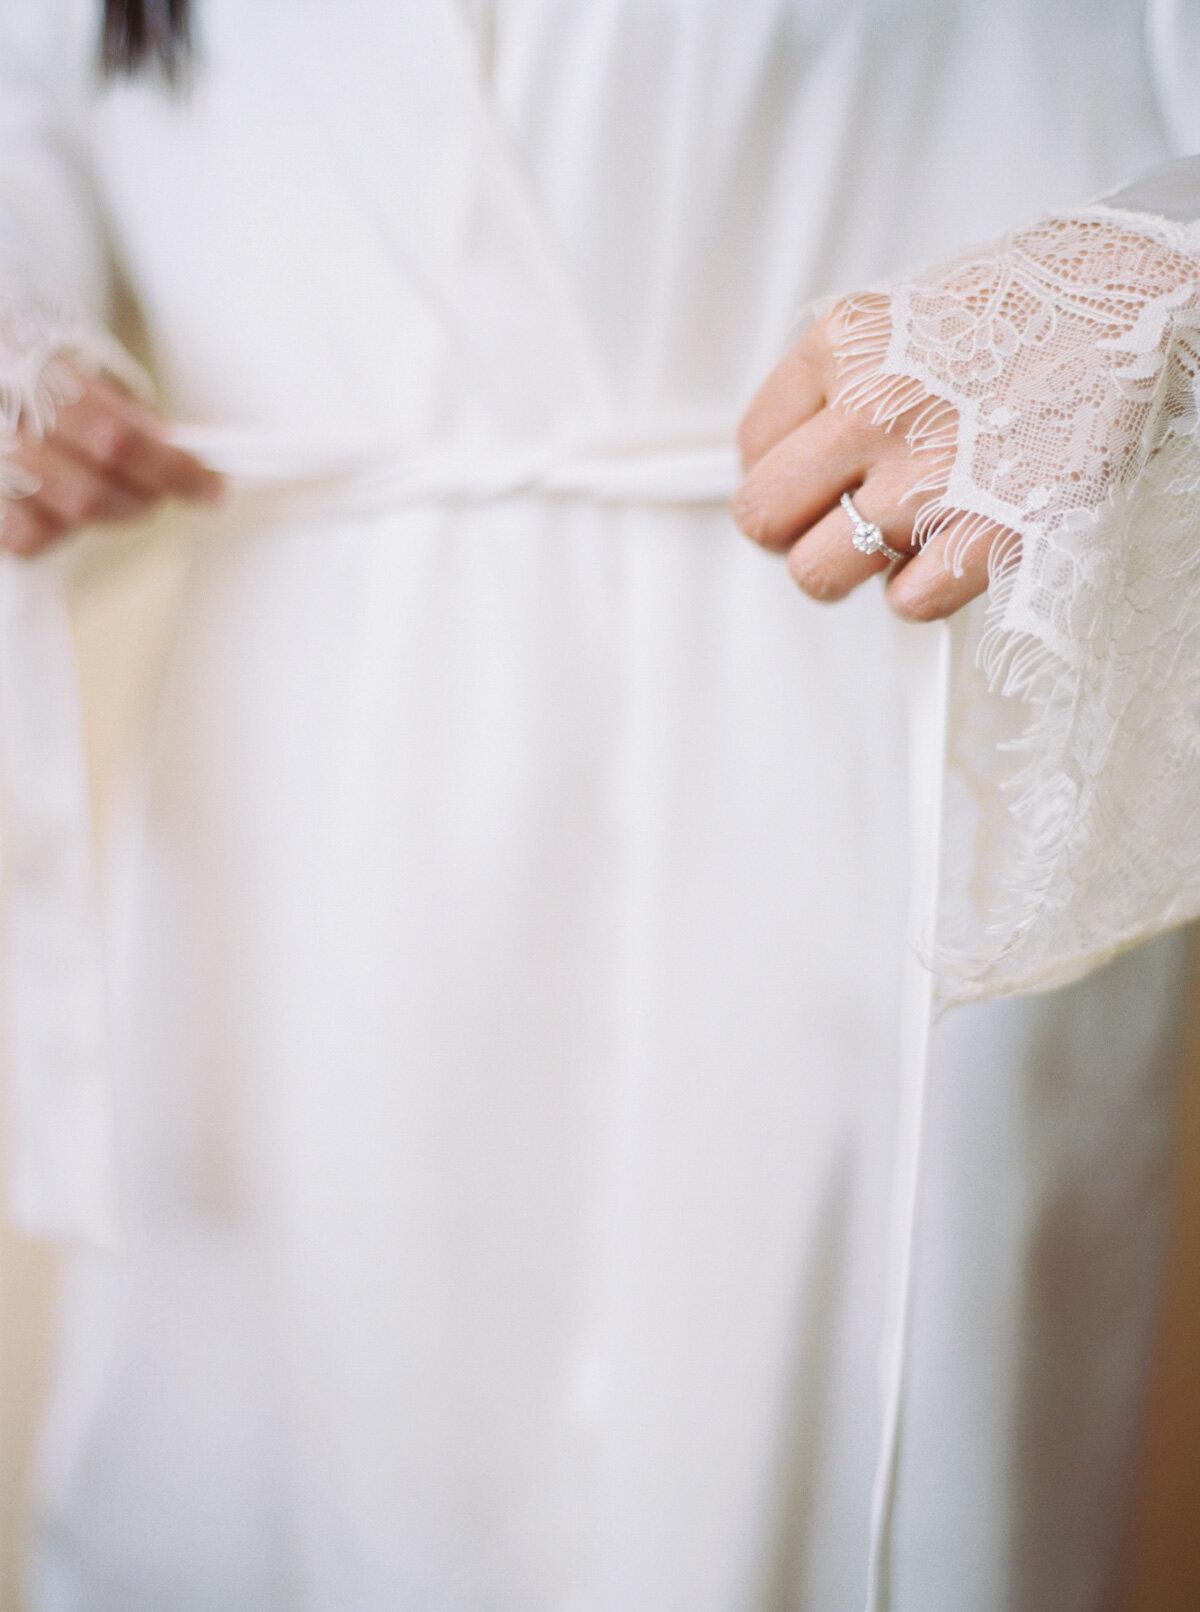 Belmond-Hotel-Caruso-ravello-elopement-Katie-Grant-destination-wedding (11 of 50).jpg